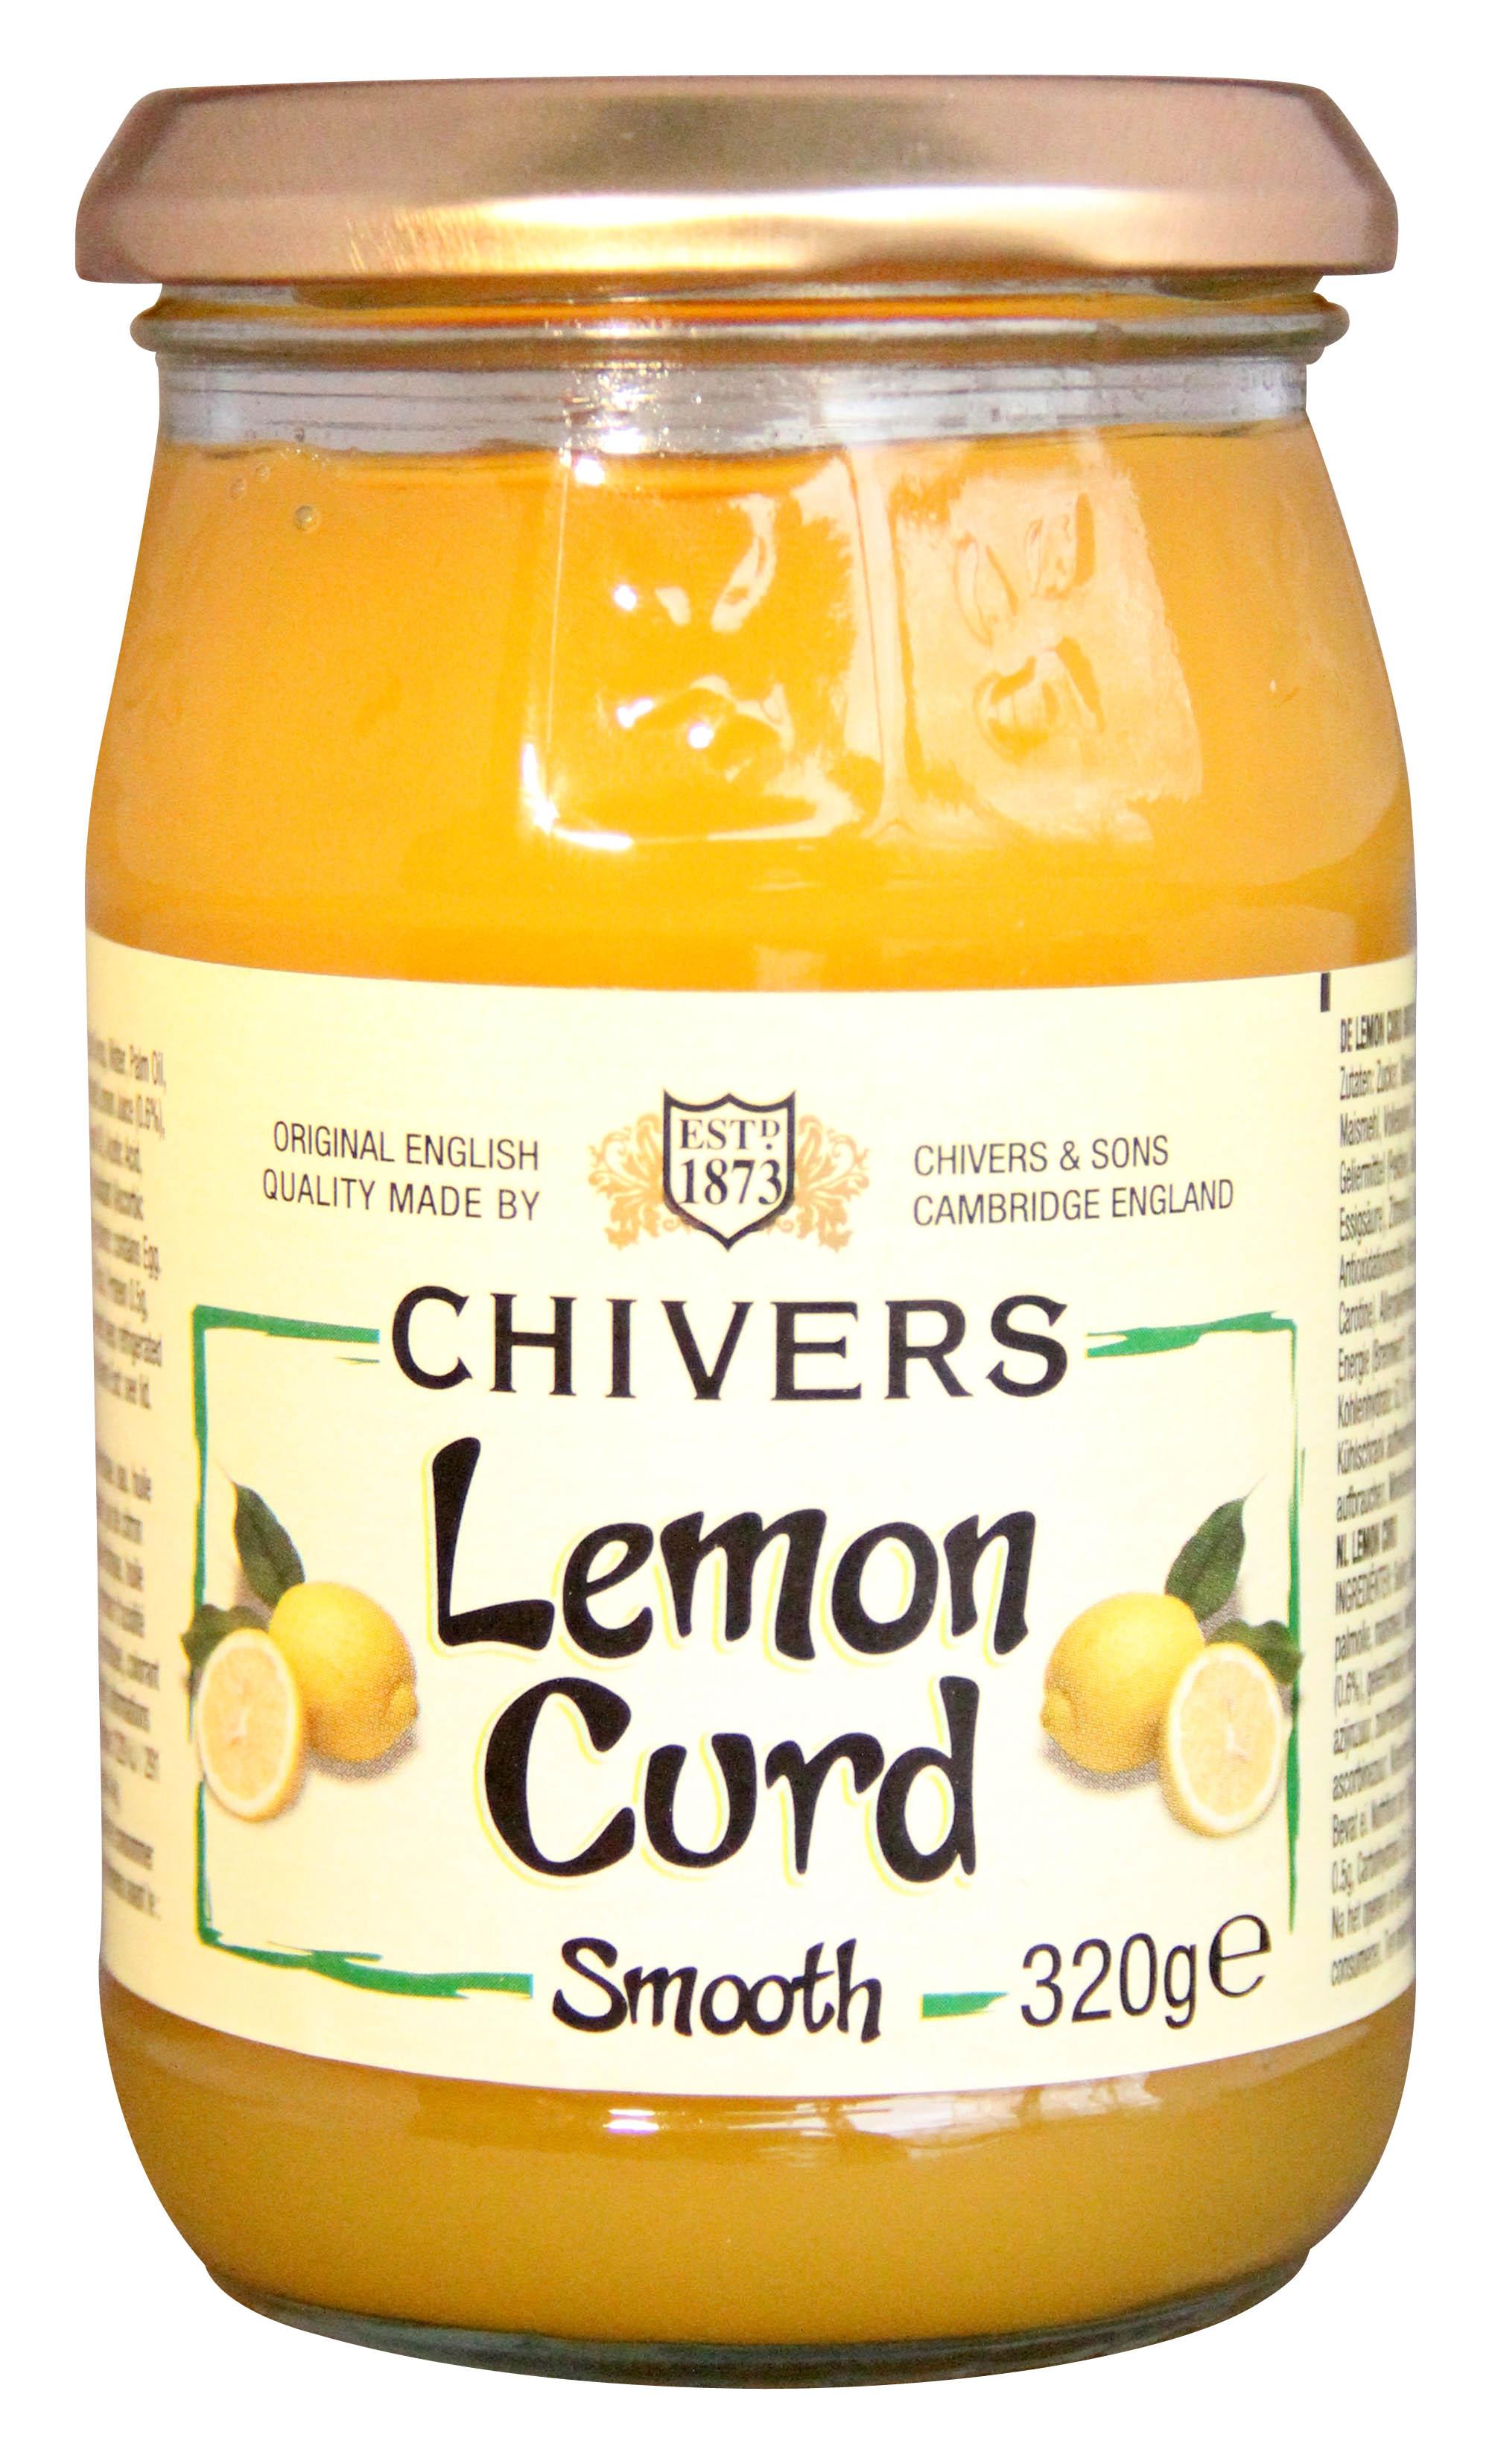 foodbox: Chivers lemoncurd + recept